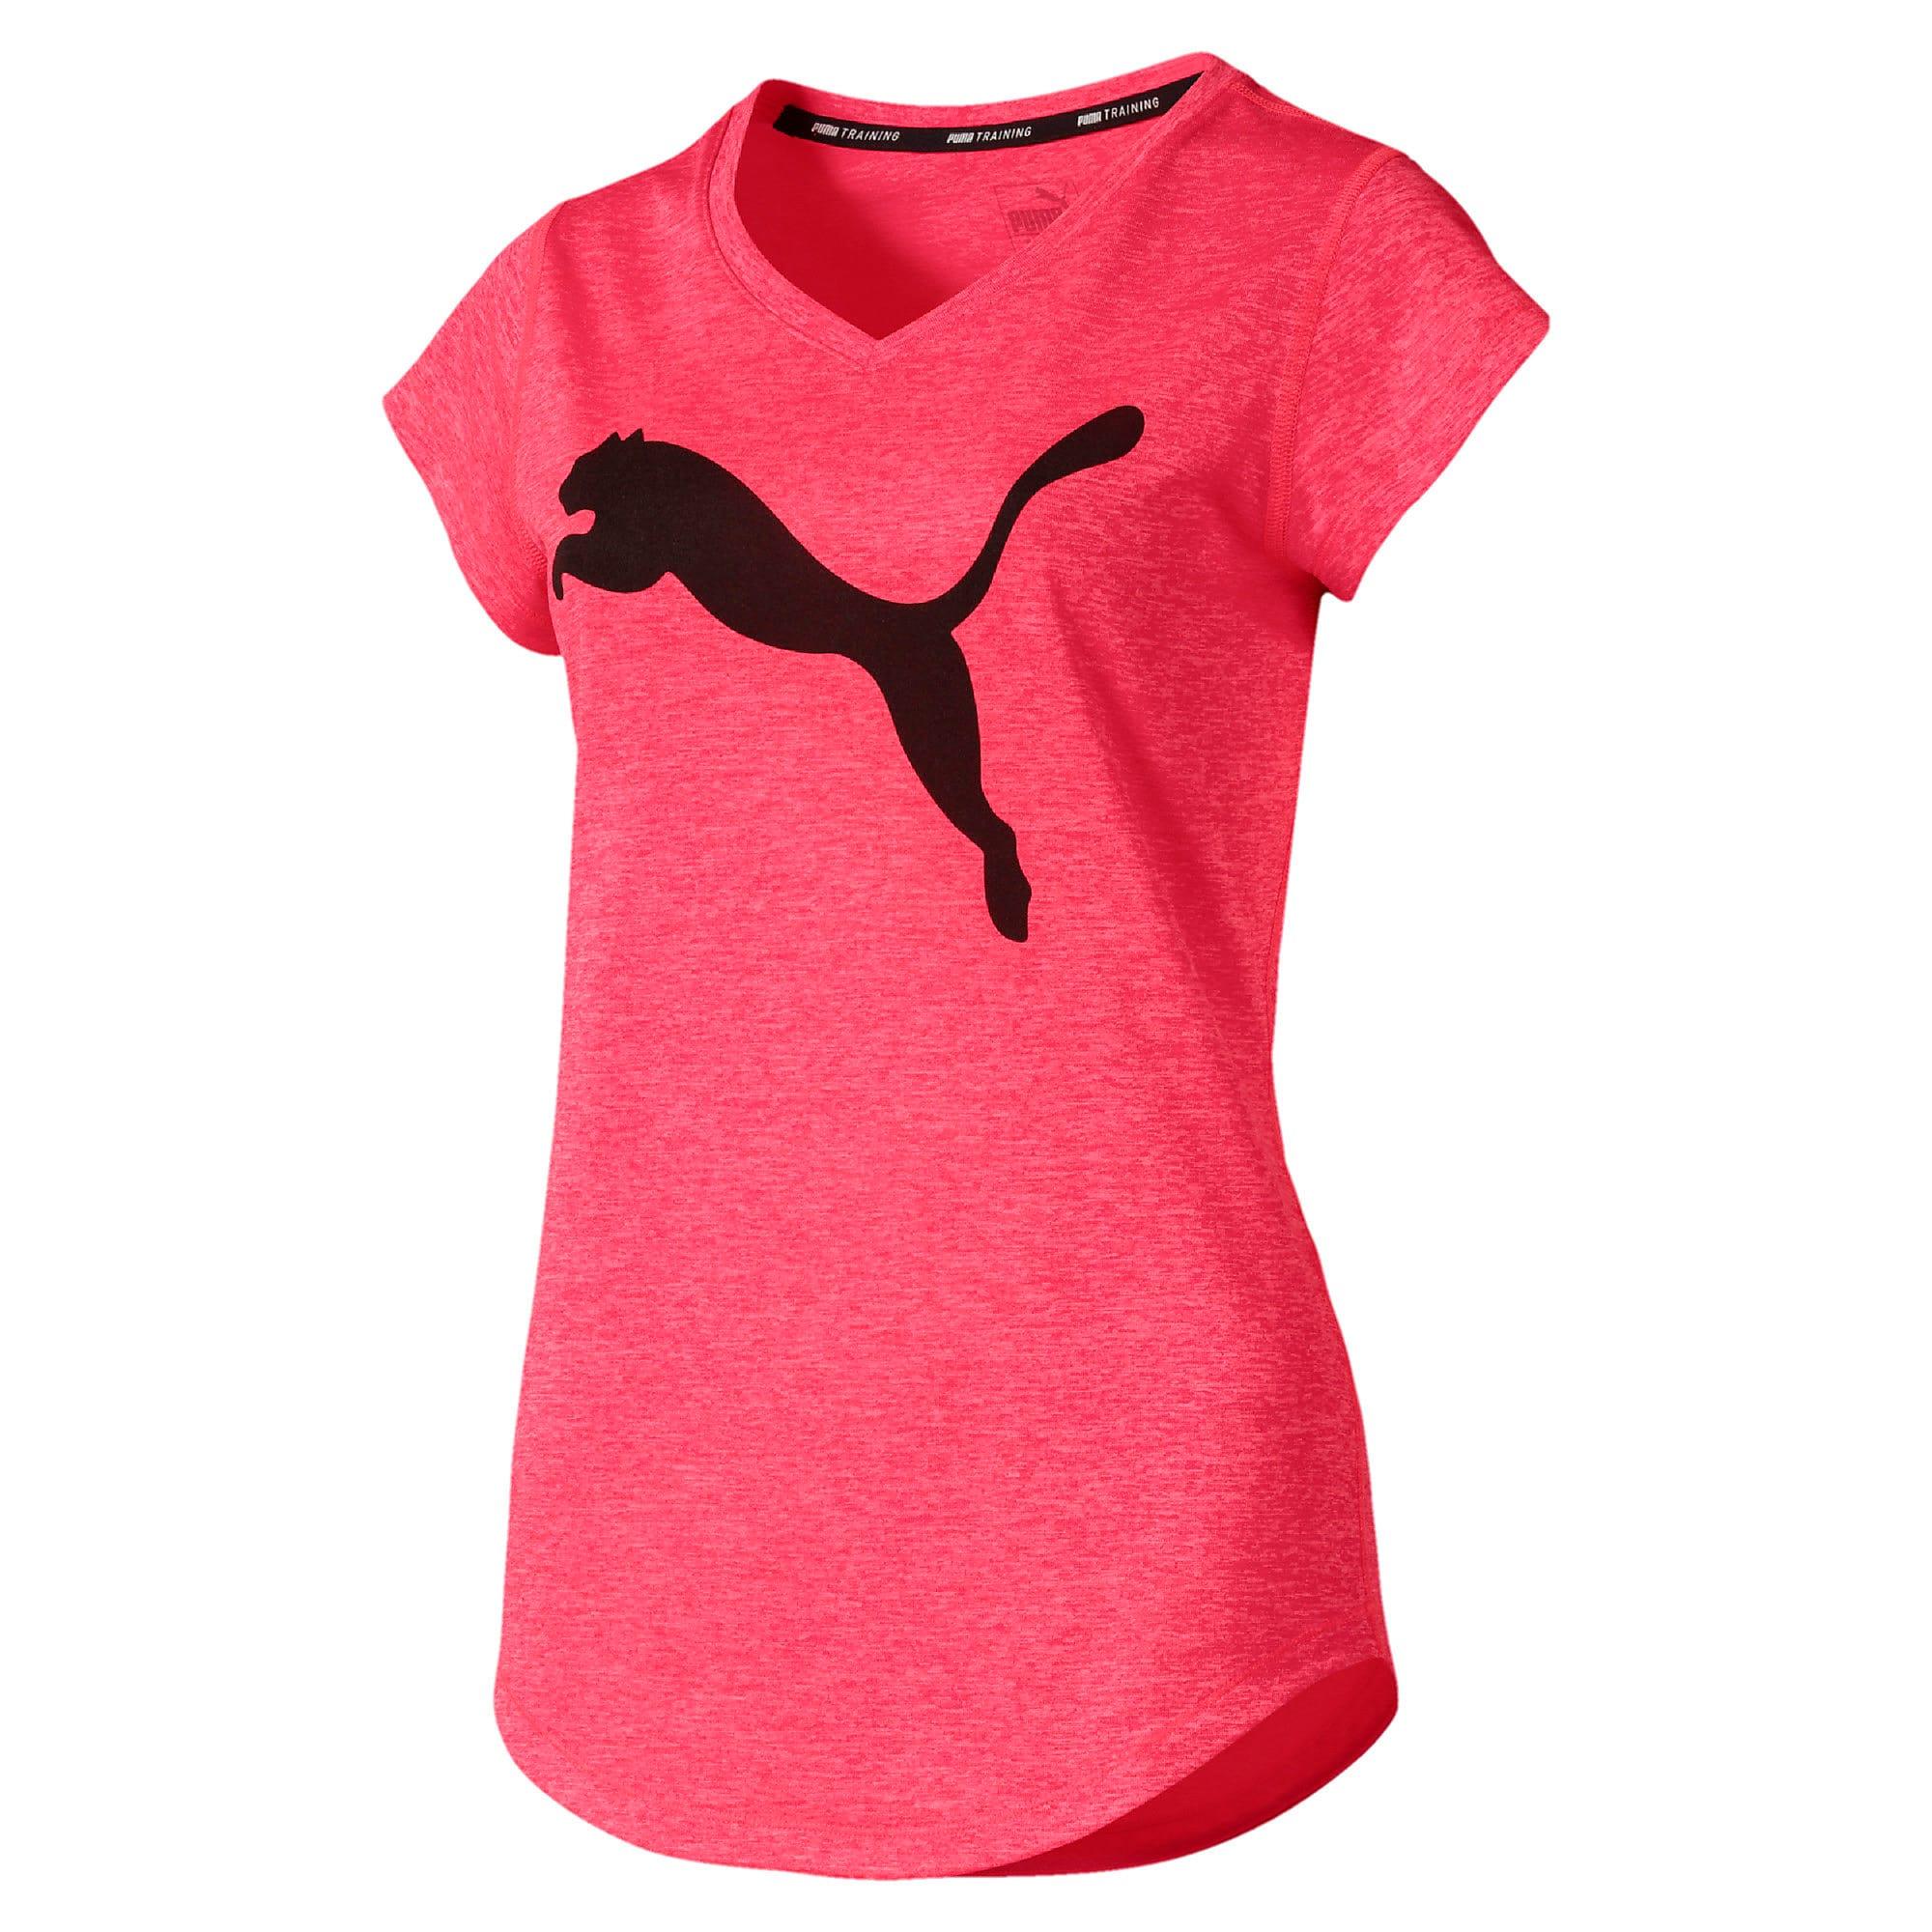 Thumbnail 4 of ヘザー キャット ウィメンズ ランニング Tシャツ 半袖, Pink Alert, medium-JPN